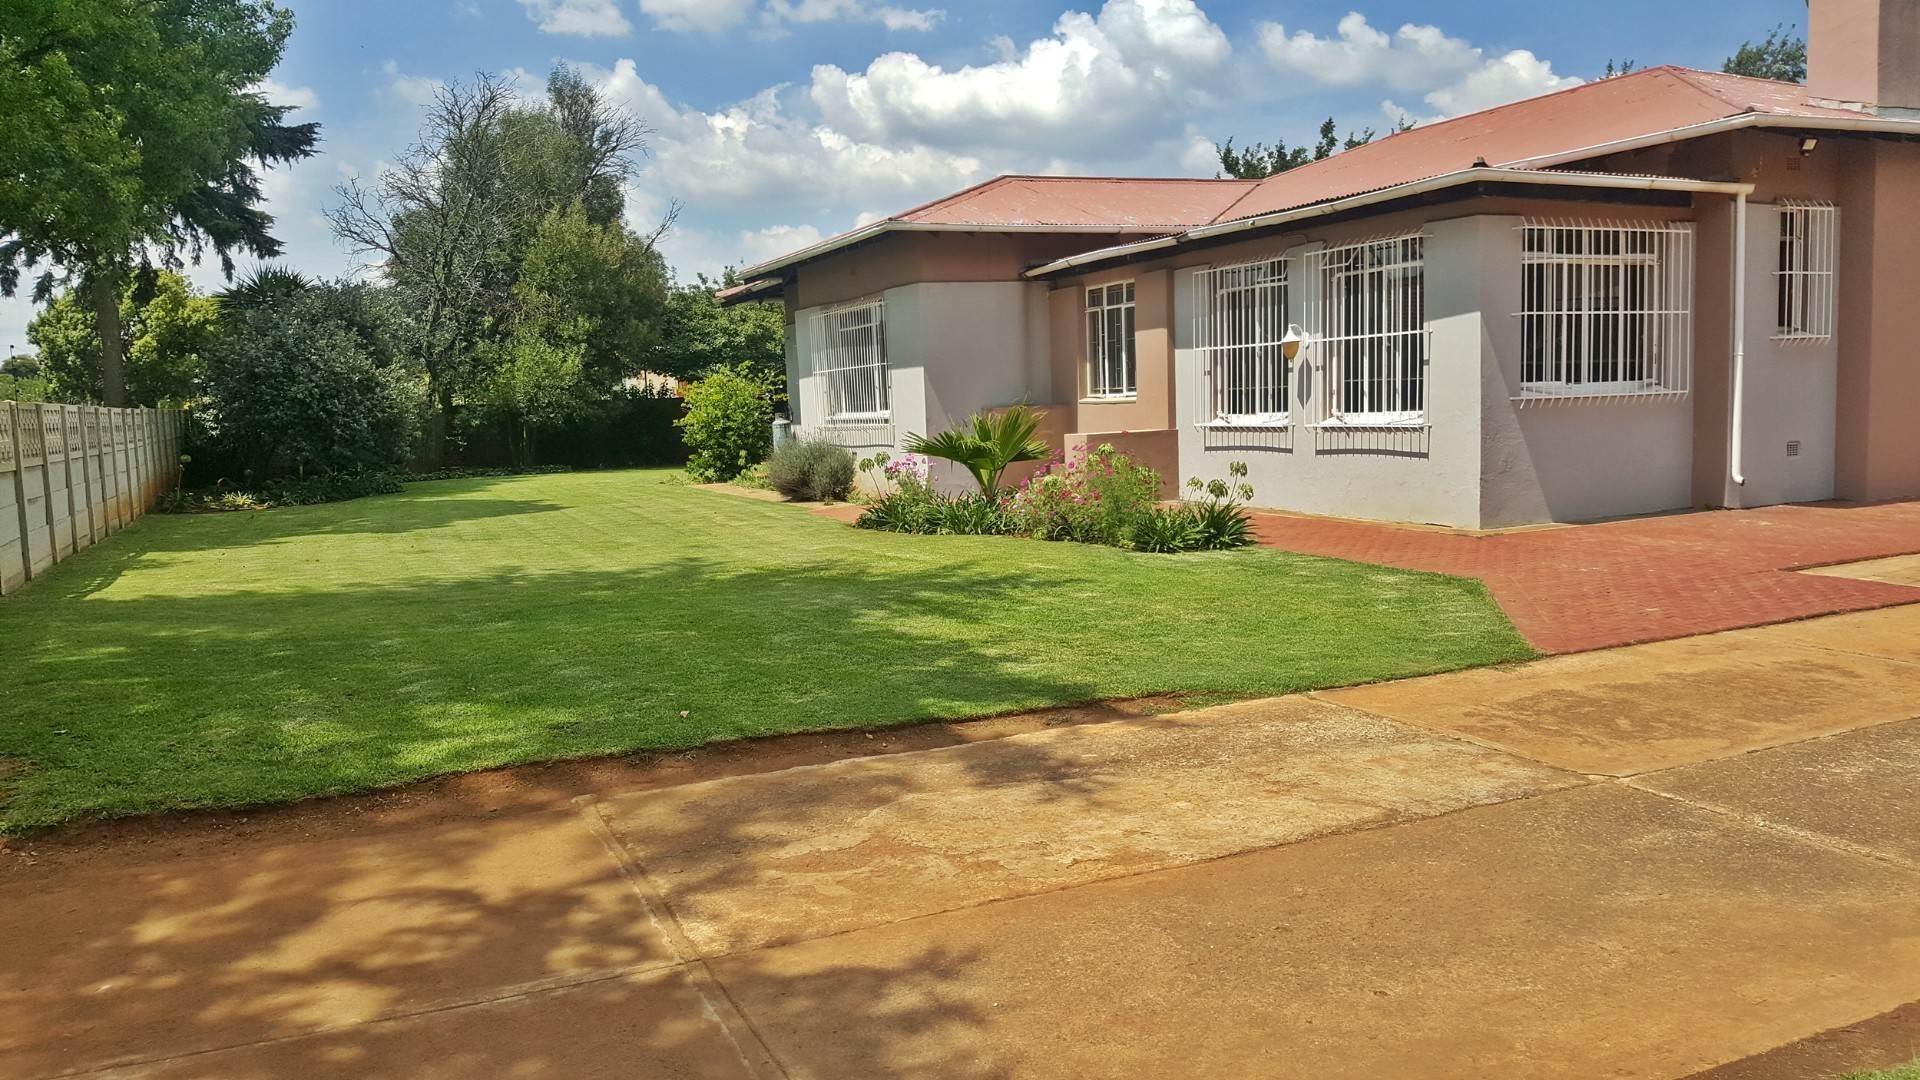 4 BedroomHouse For Sale In Dersley